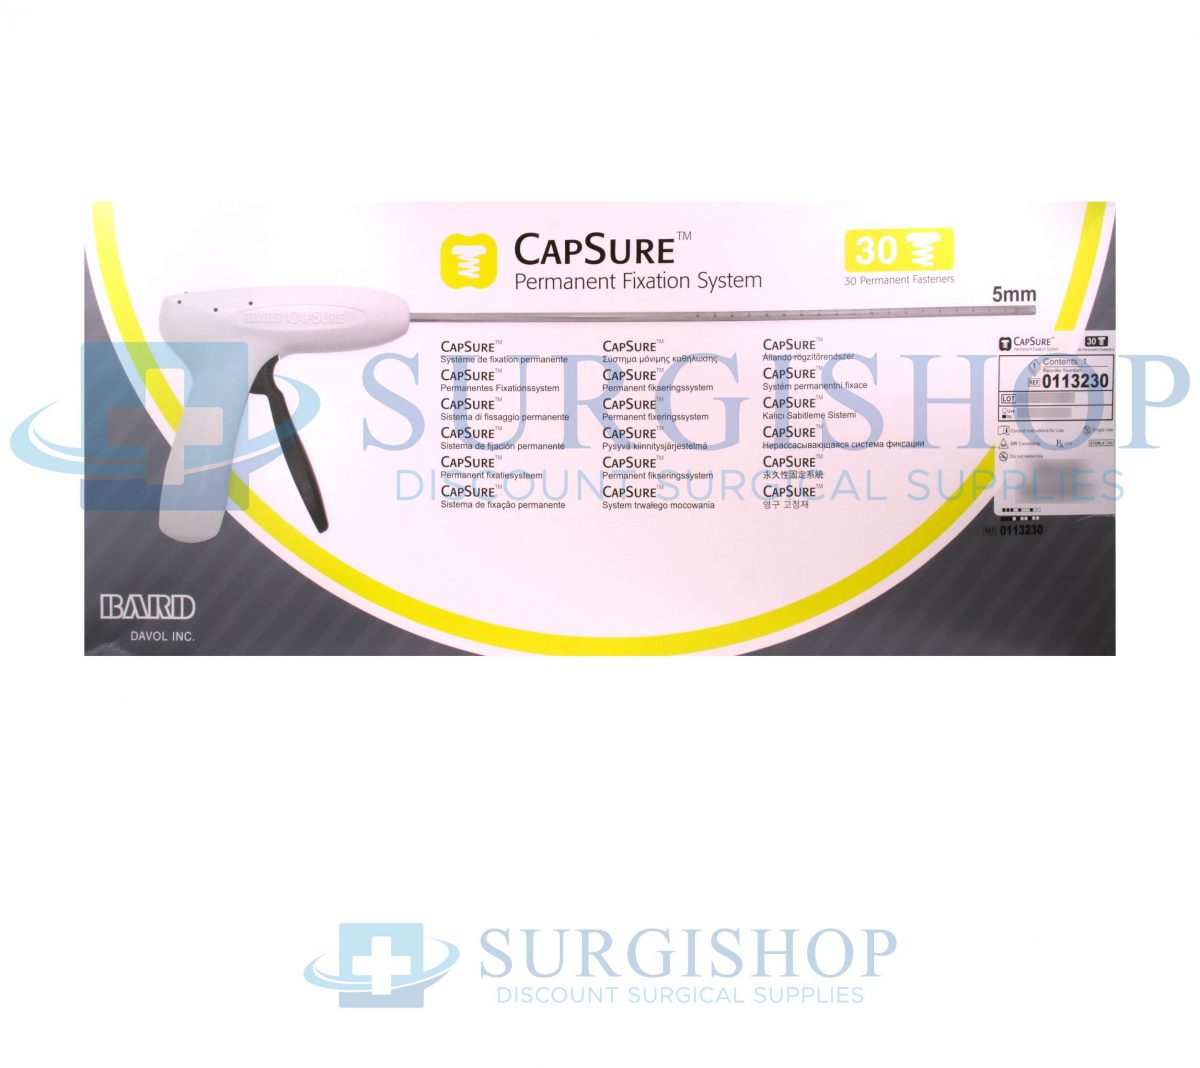 Bard Capsure Permanent Fixation System